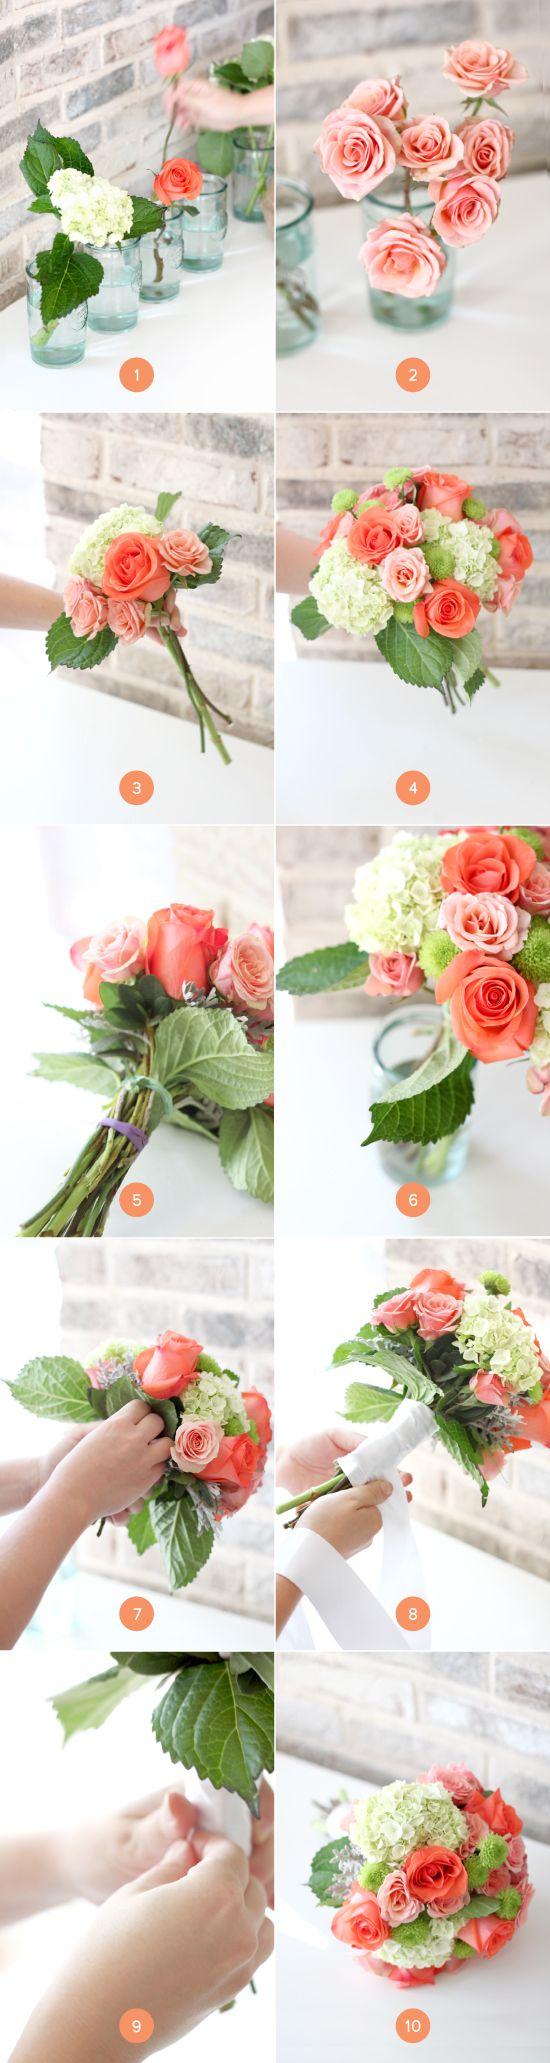 DIY Grocery Store Bridal Bouquet Diy wedding flowers